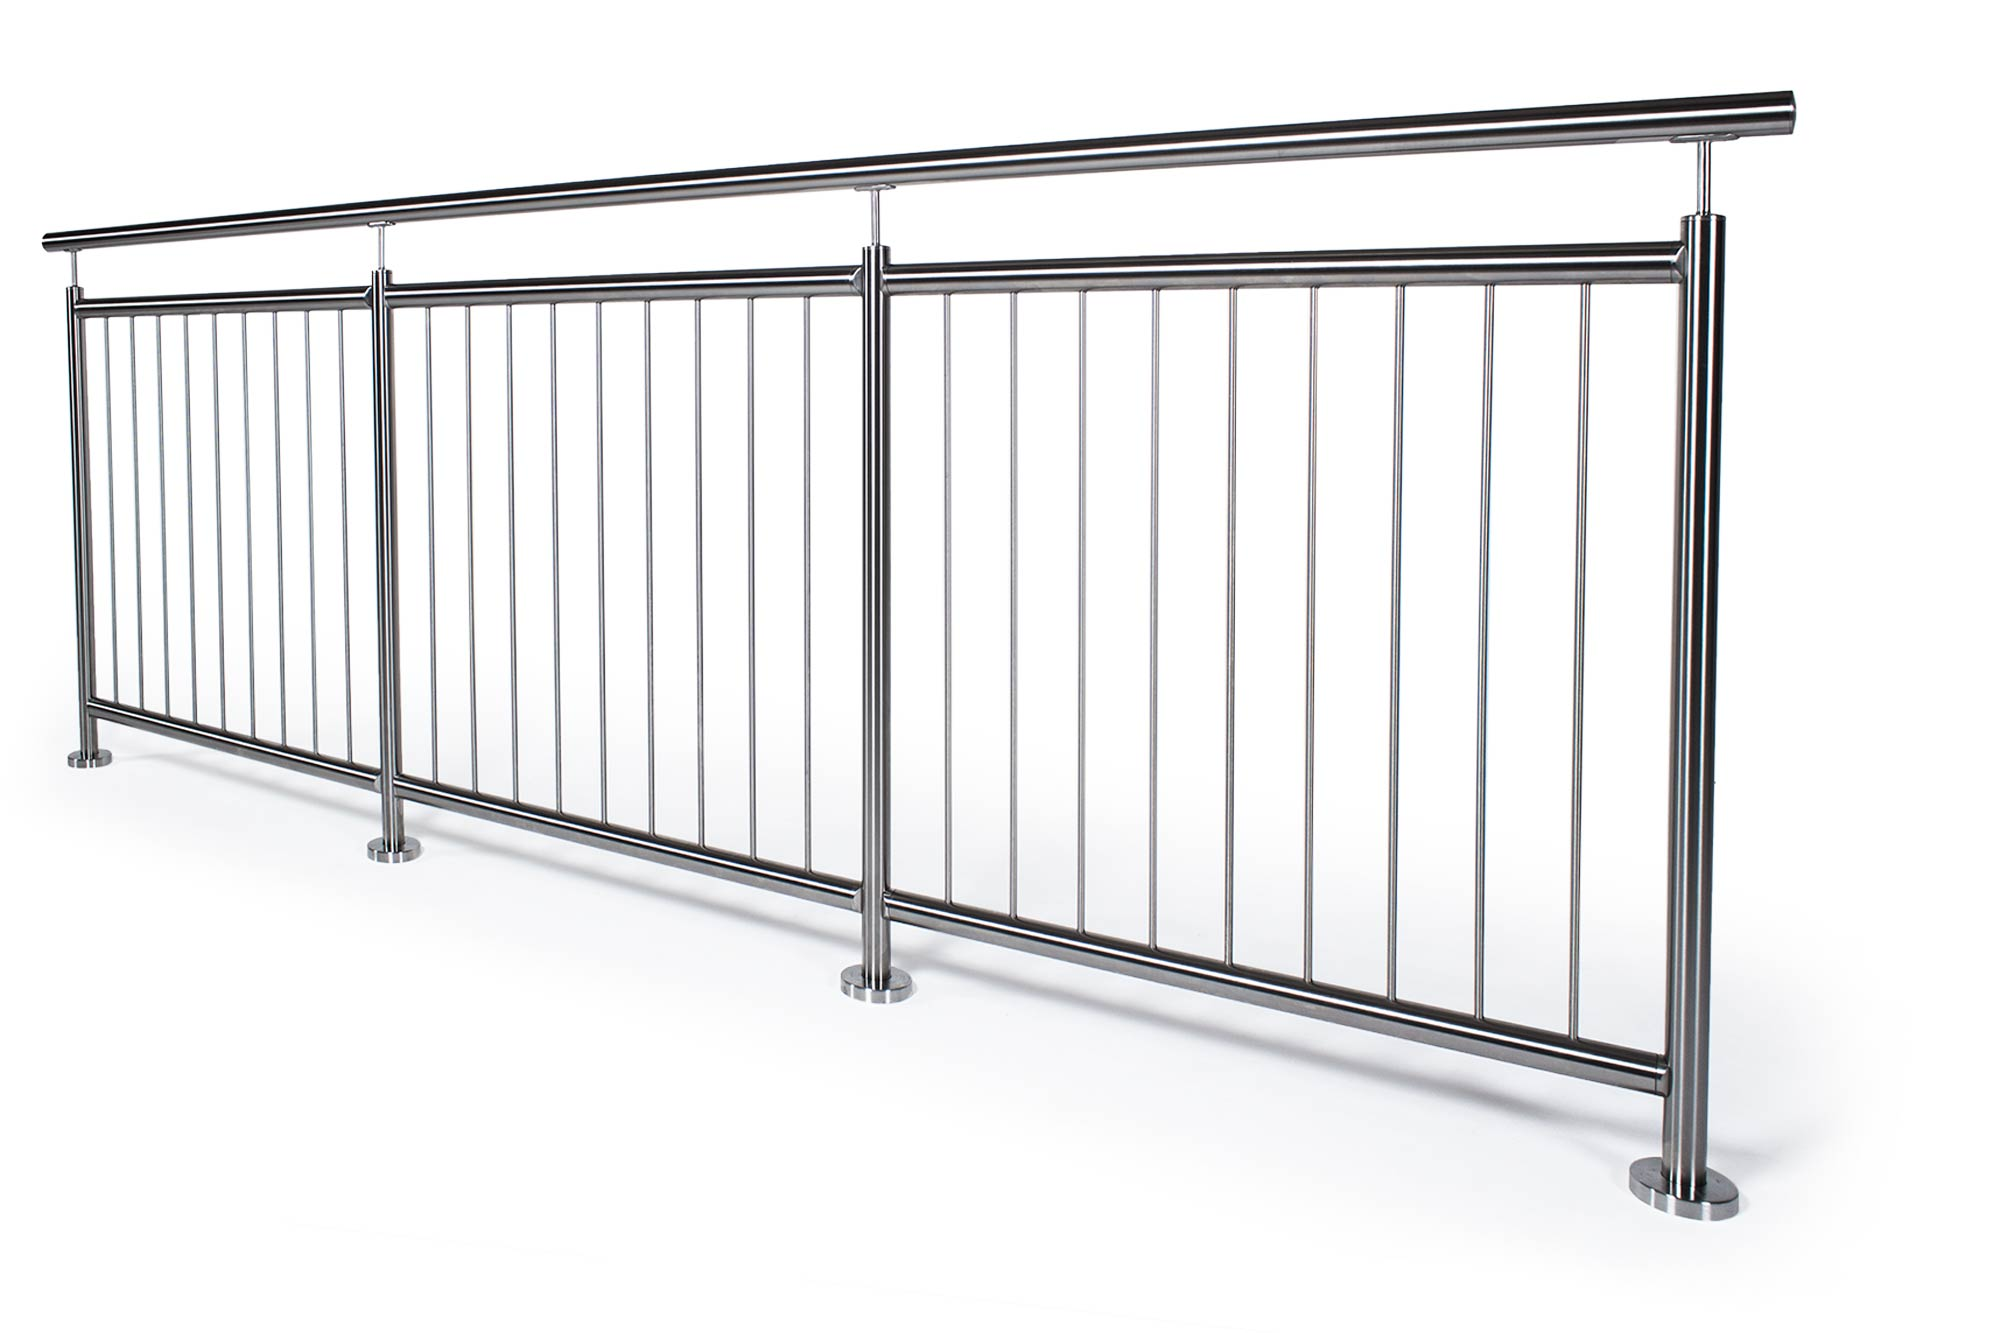 edelstahlstaketengel nder f r balkone terrassen oder. Black Bedroom Furniture Sets. Home Design Ideas